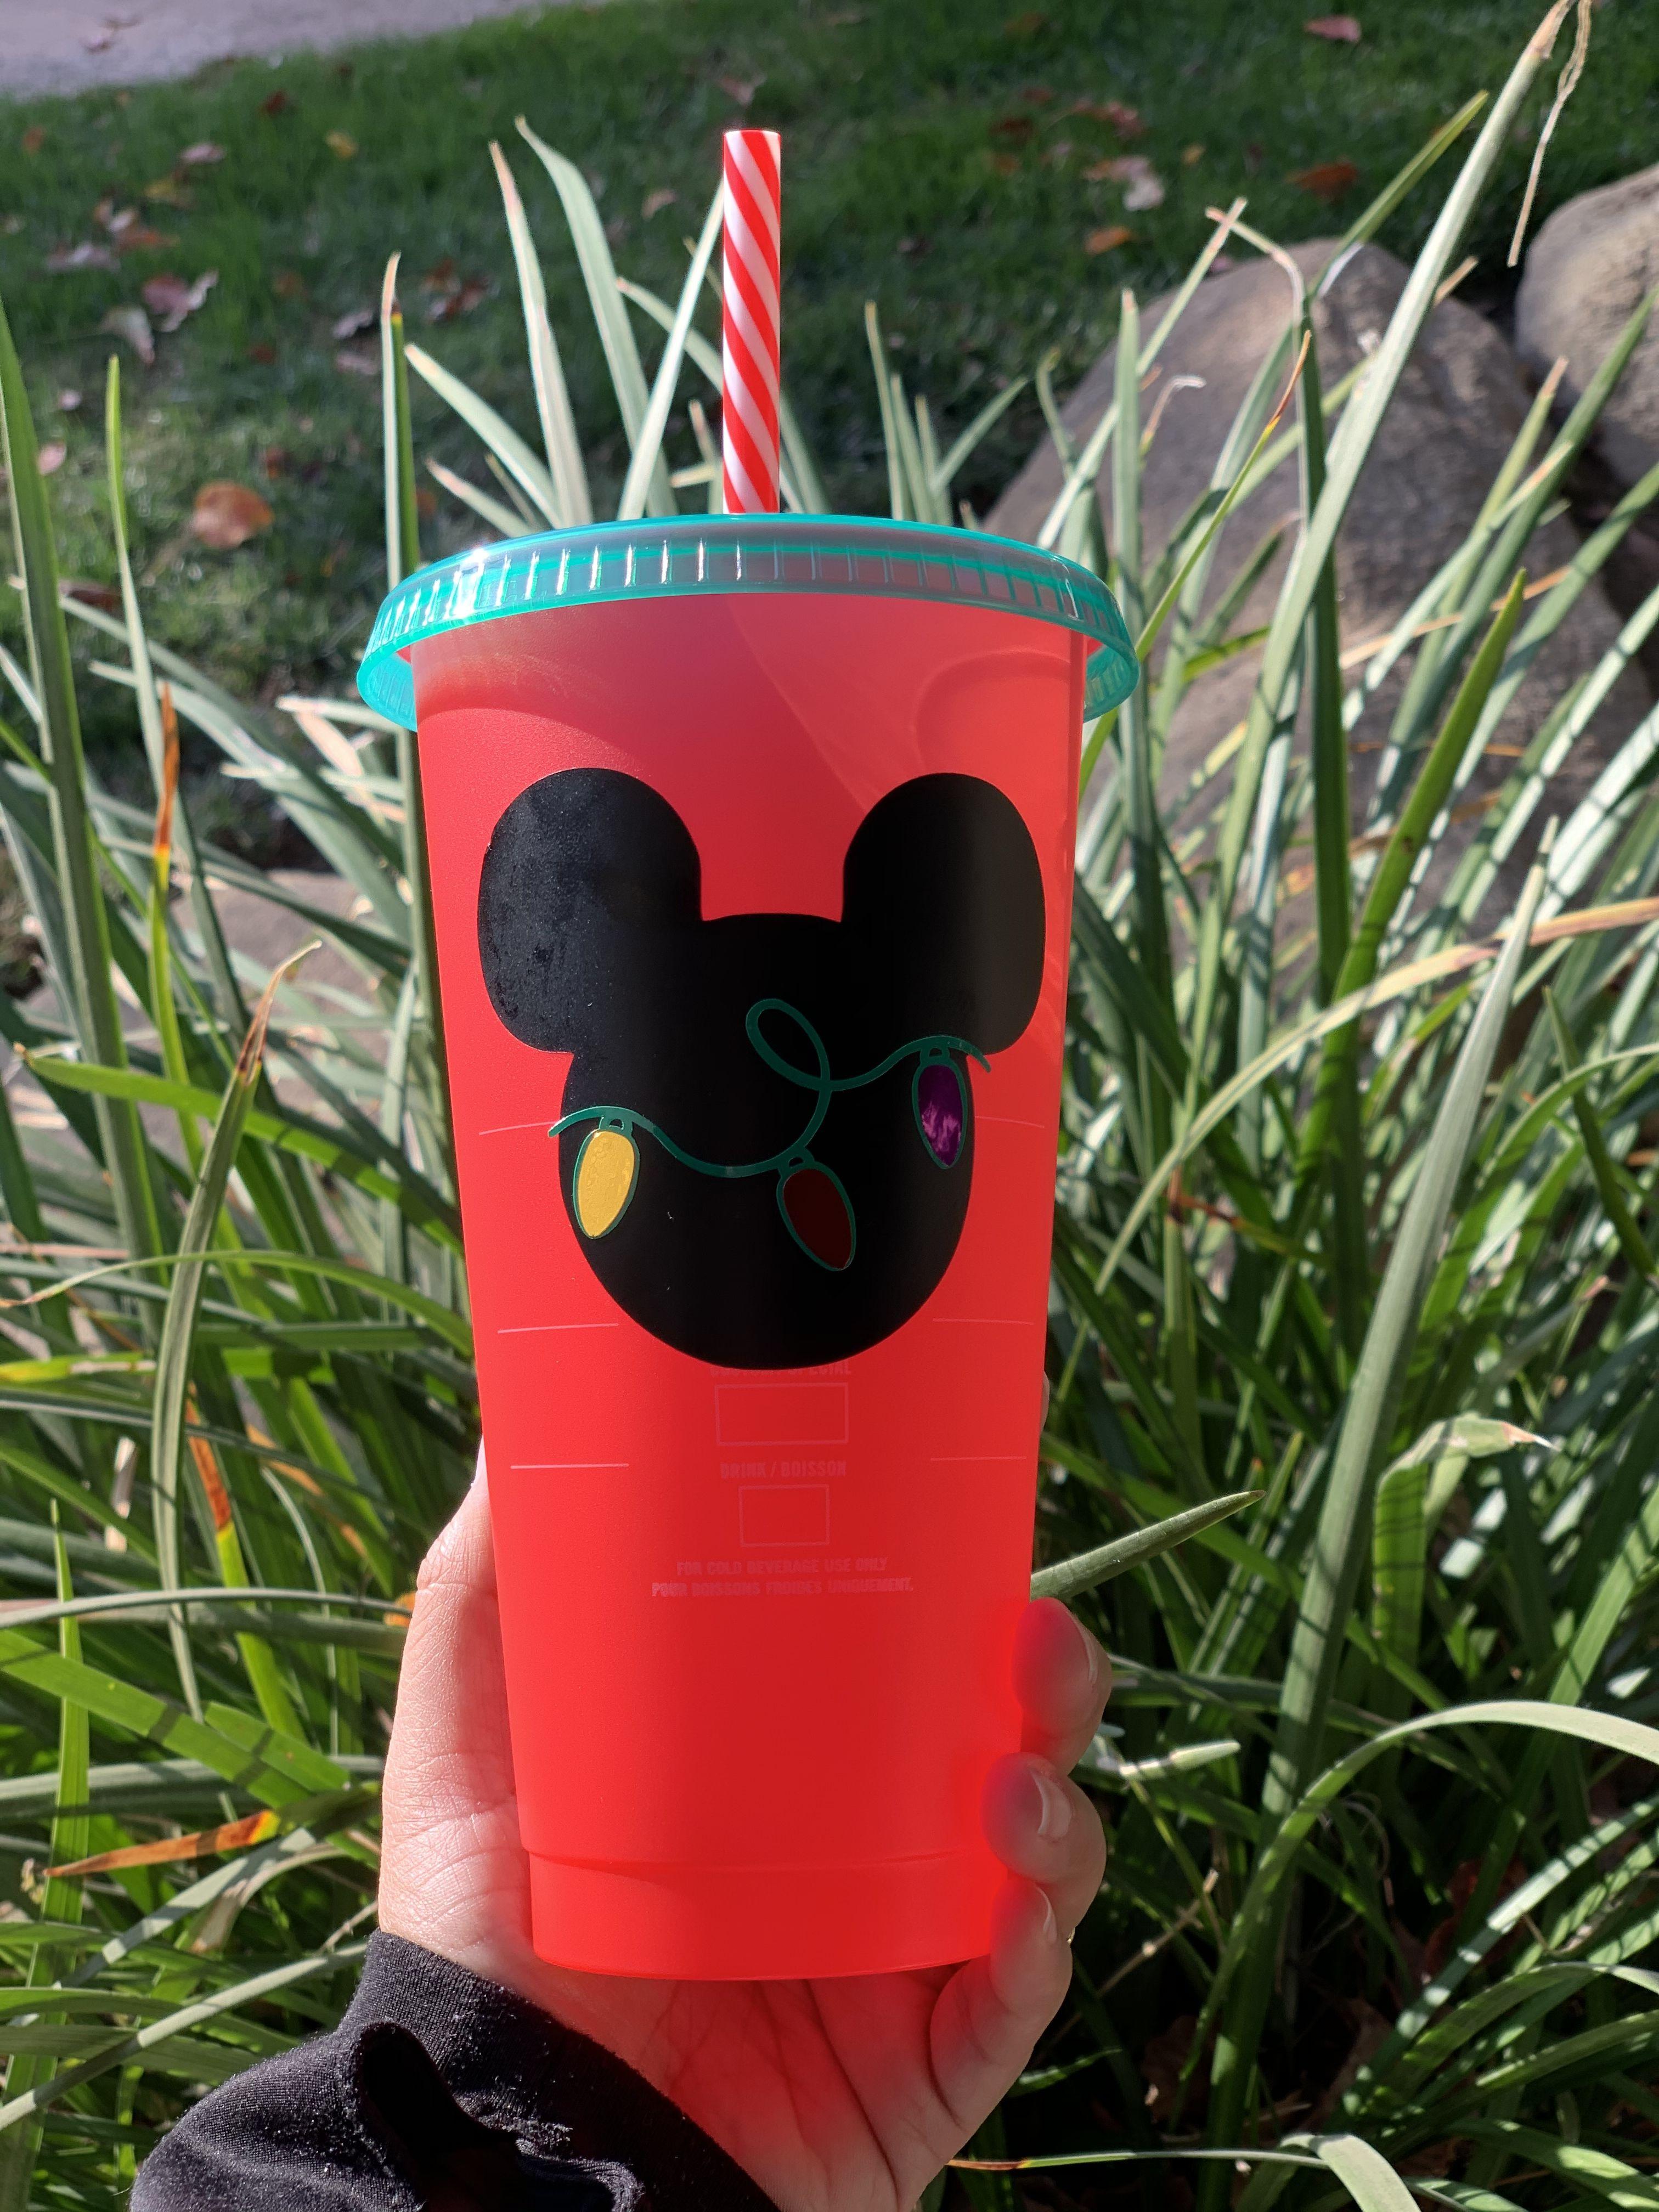 Pin By Stickymythingys On Starbucks Merchandise